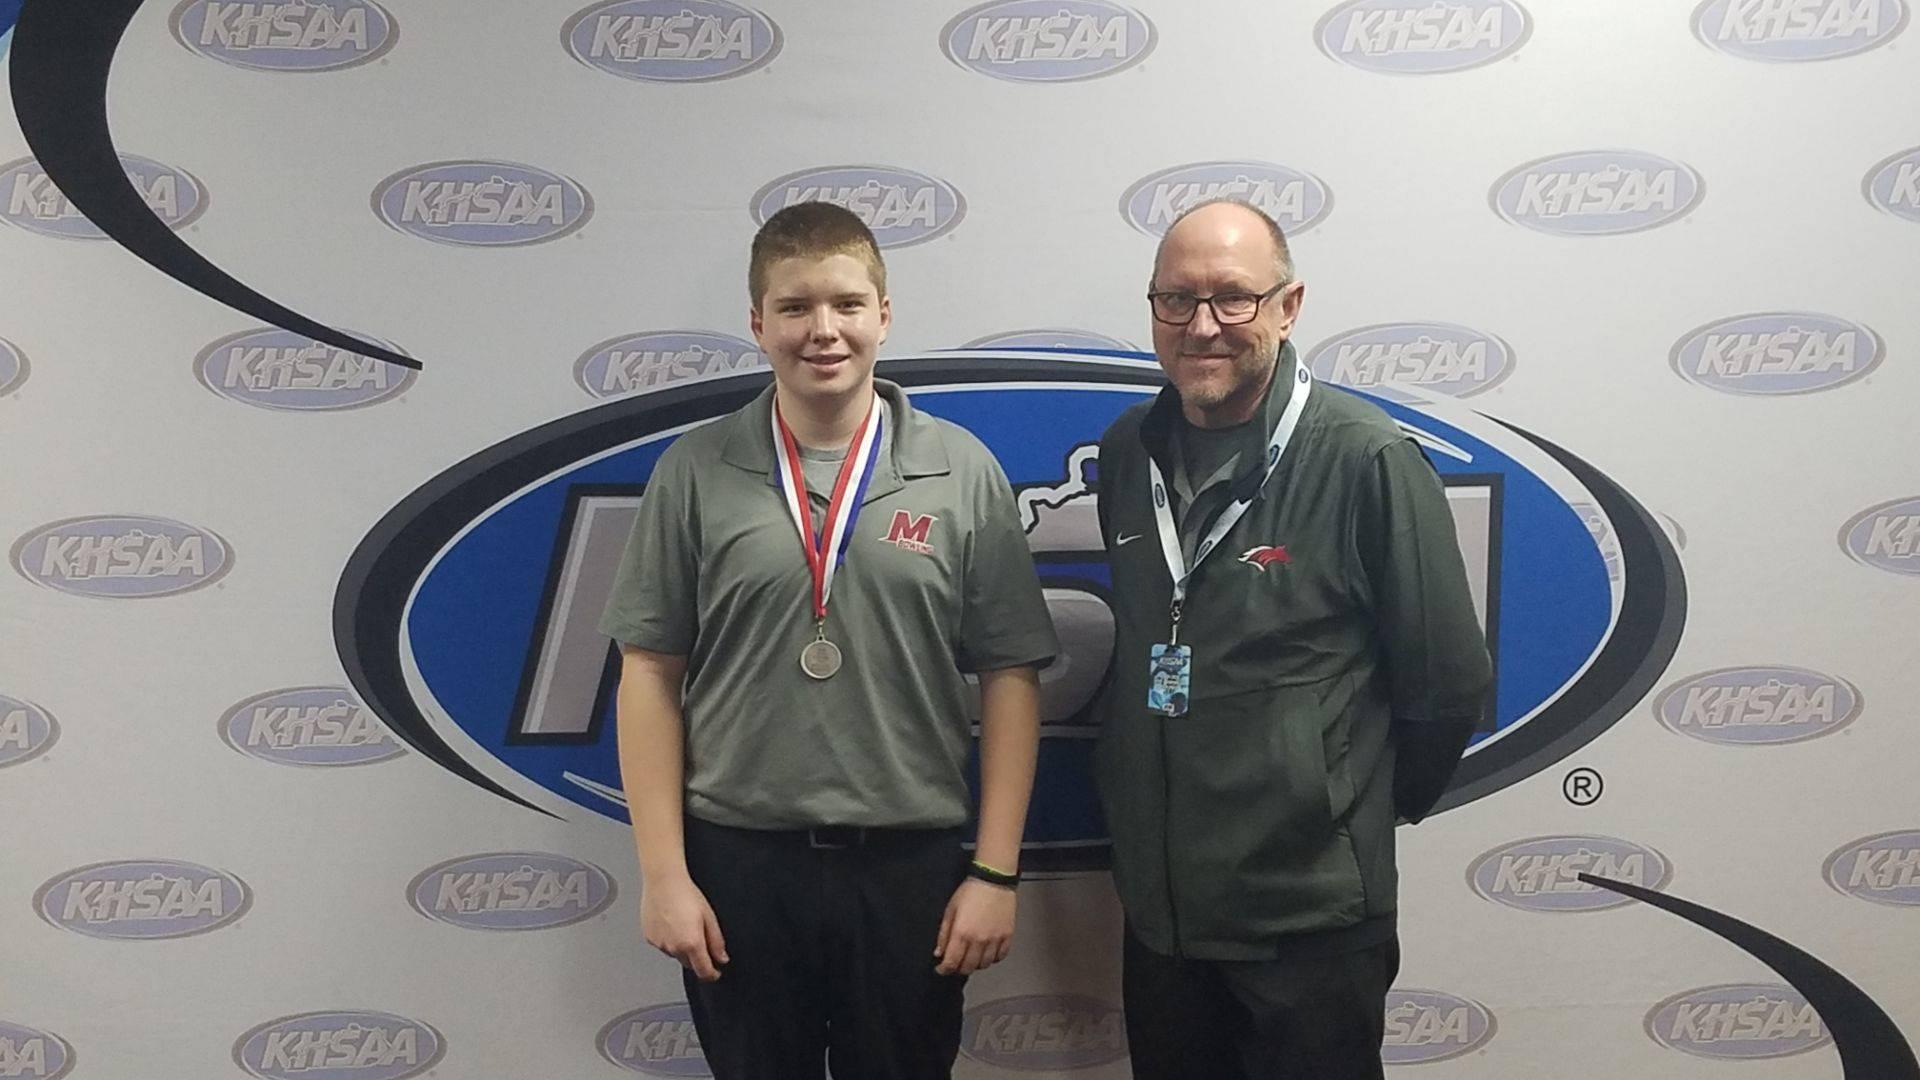 Mustangs Men's Bowling - Elliott Wilson - 2020 State Bowling Singles Runner-Up!